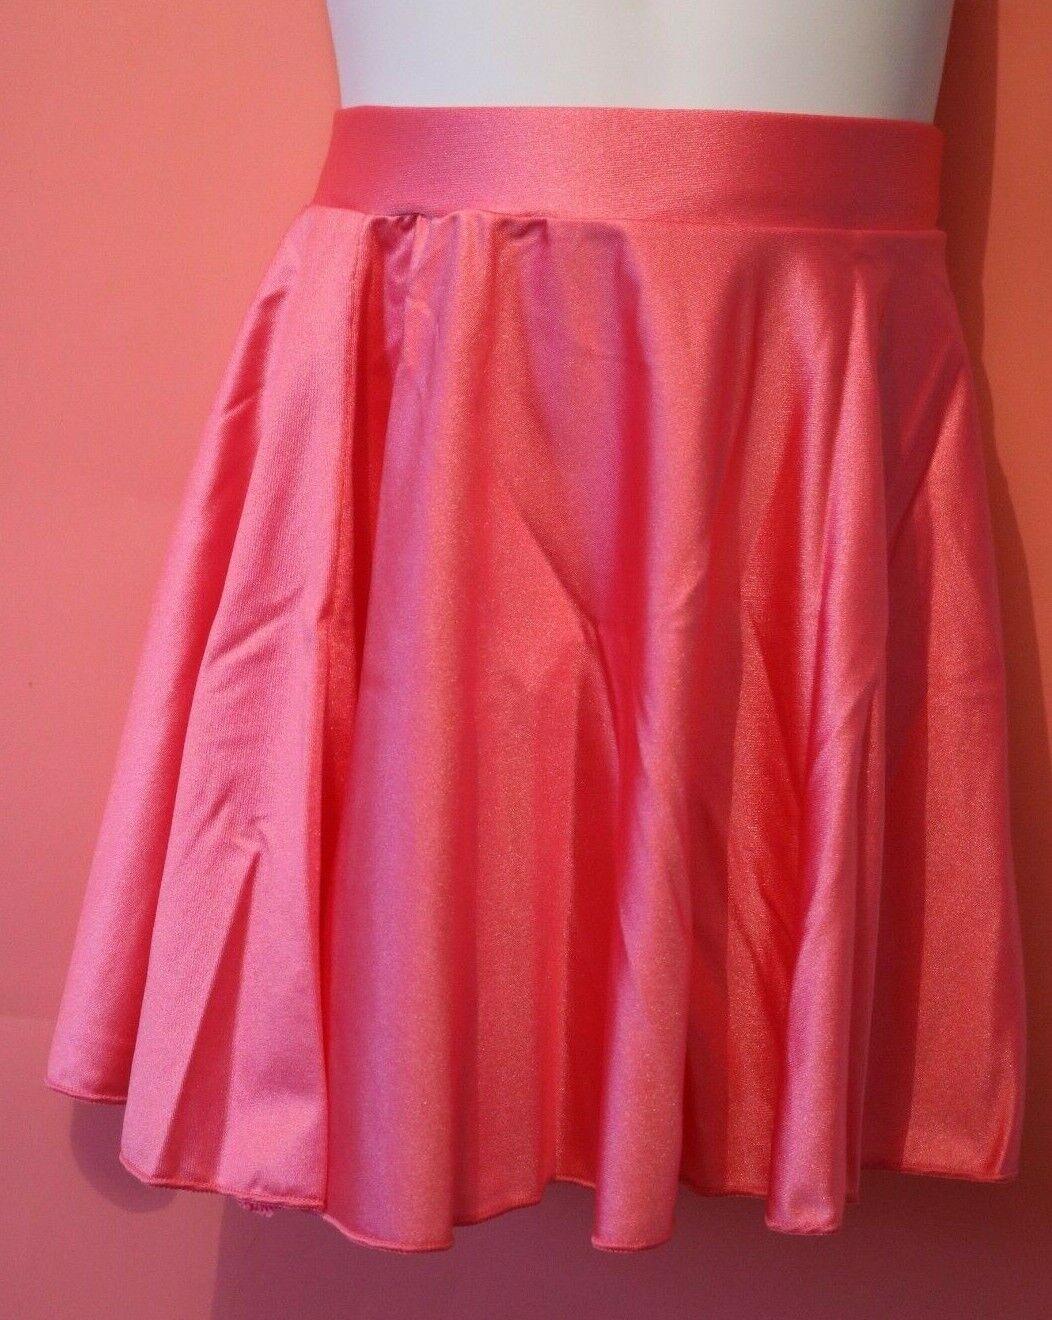 Adagio Pink Circular Skirt Large Nylon Lycra NEW